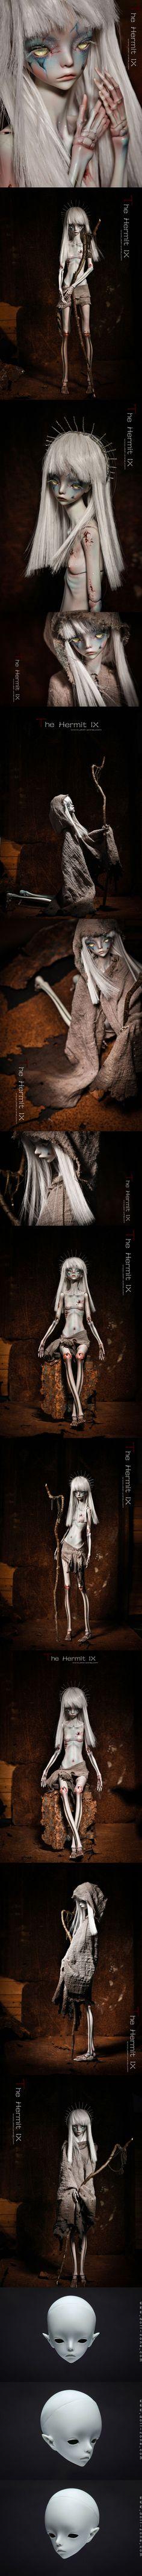 BJD Limited Edition Hermit IX 49cm Girl Ball-jointed Doll_Limited Edition_DOLLZONE_DOLL_Ball Jointed Dolls (BJD) company-Legenddoll